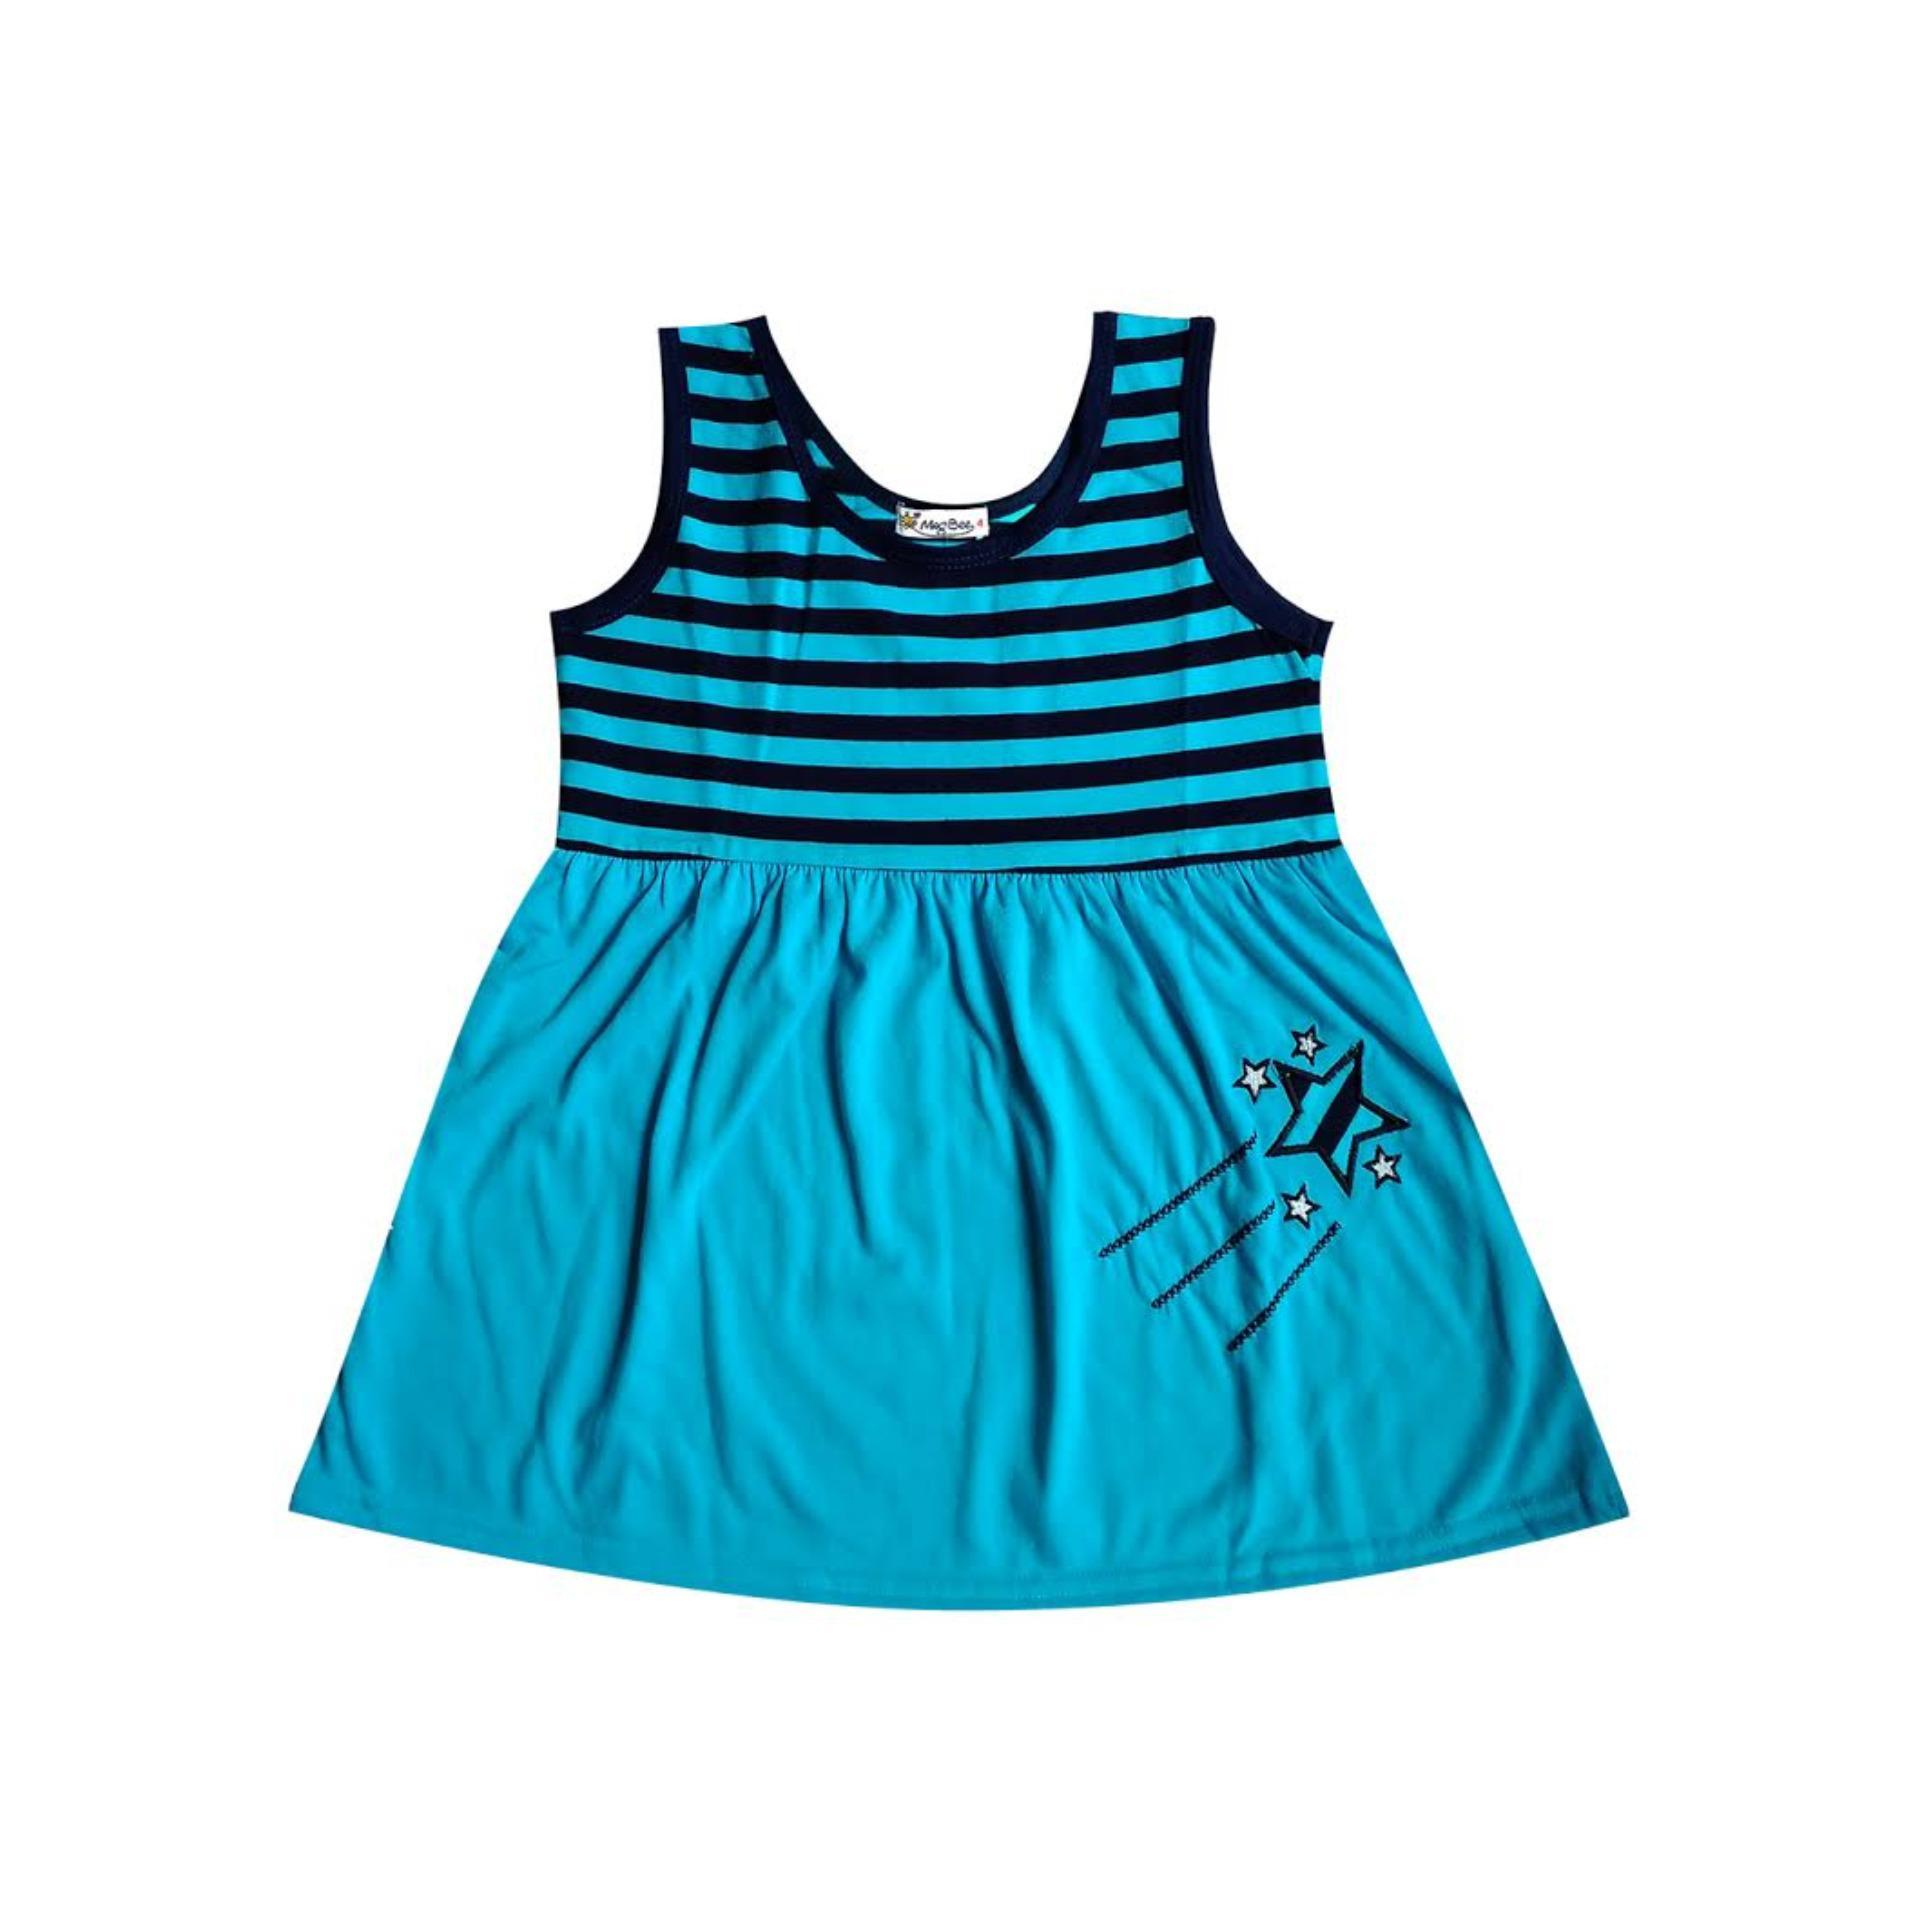 Macbee Kids Baju Anak Dress Stripy Beetle Size 6 Orange Sky Stars Blue